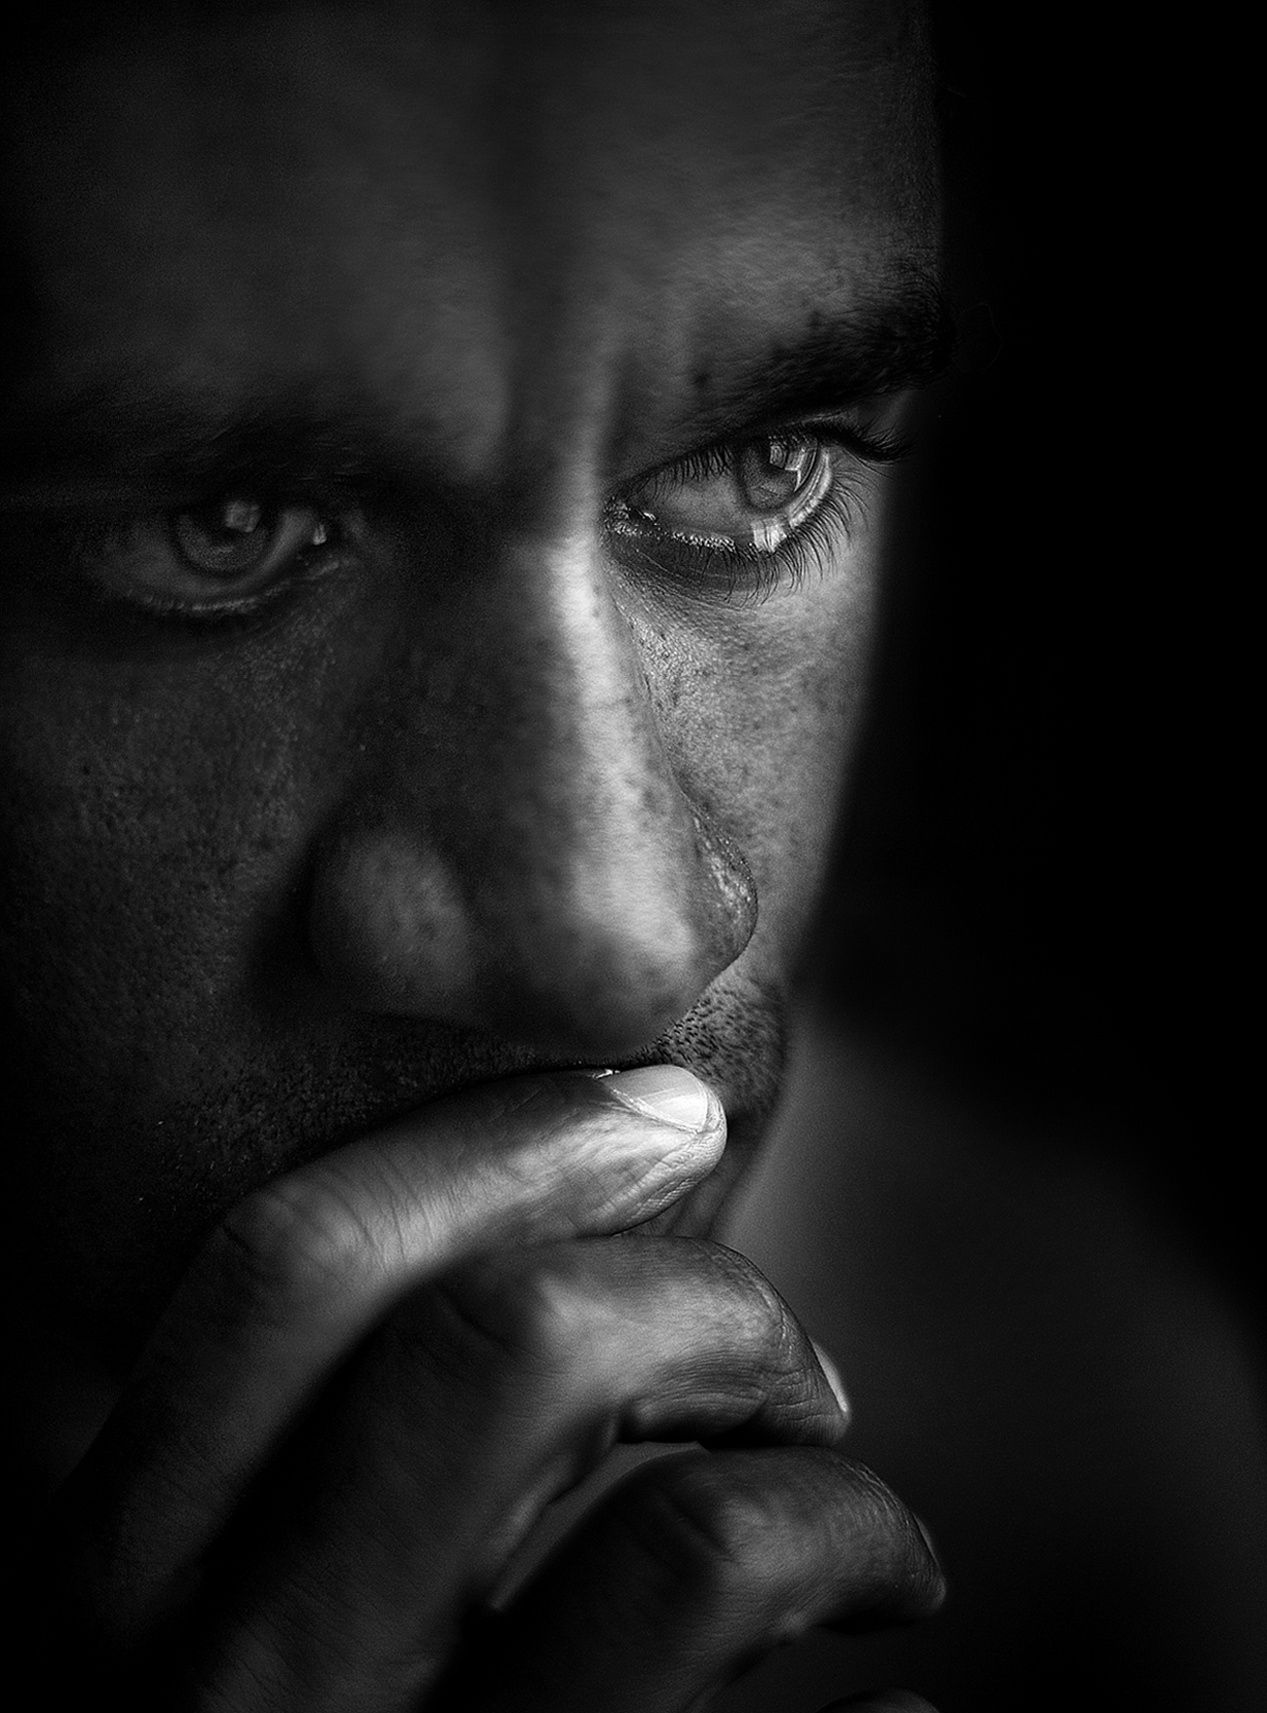 Wild or sad by aidan photograffeuse on 500px